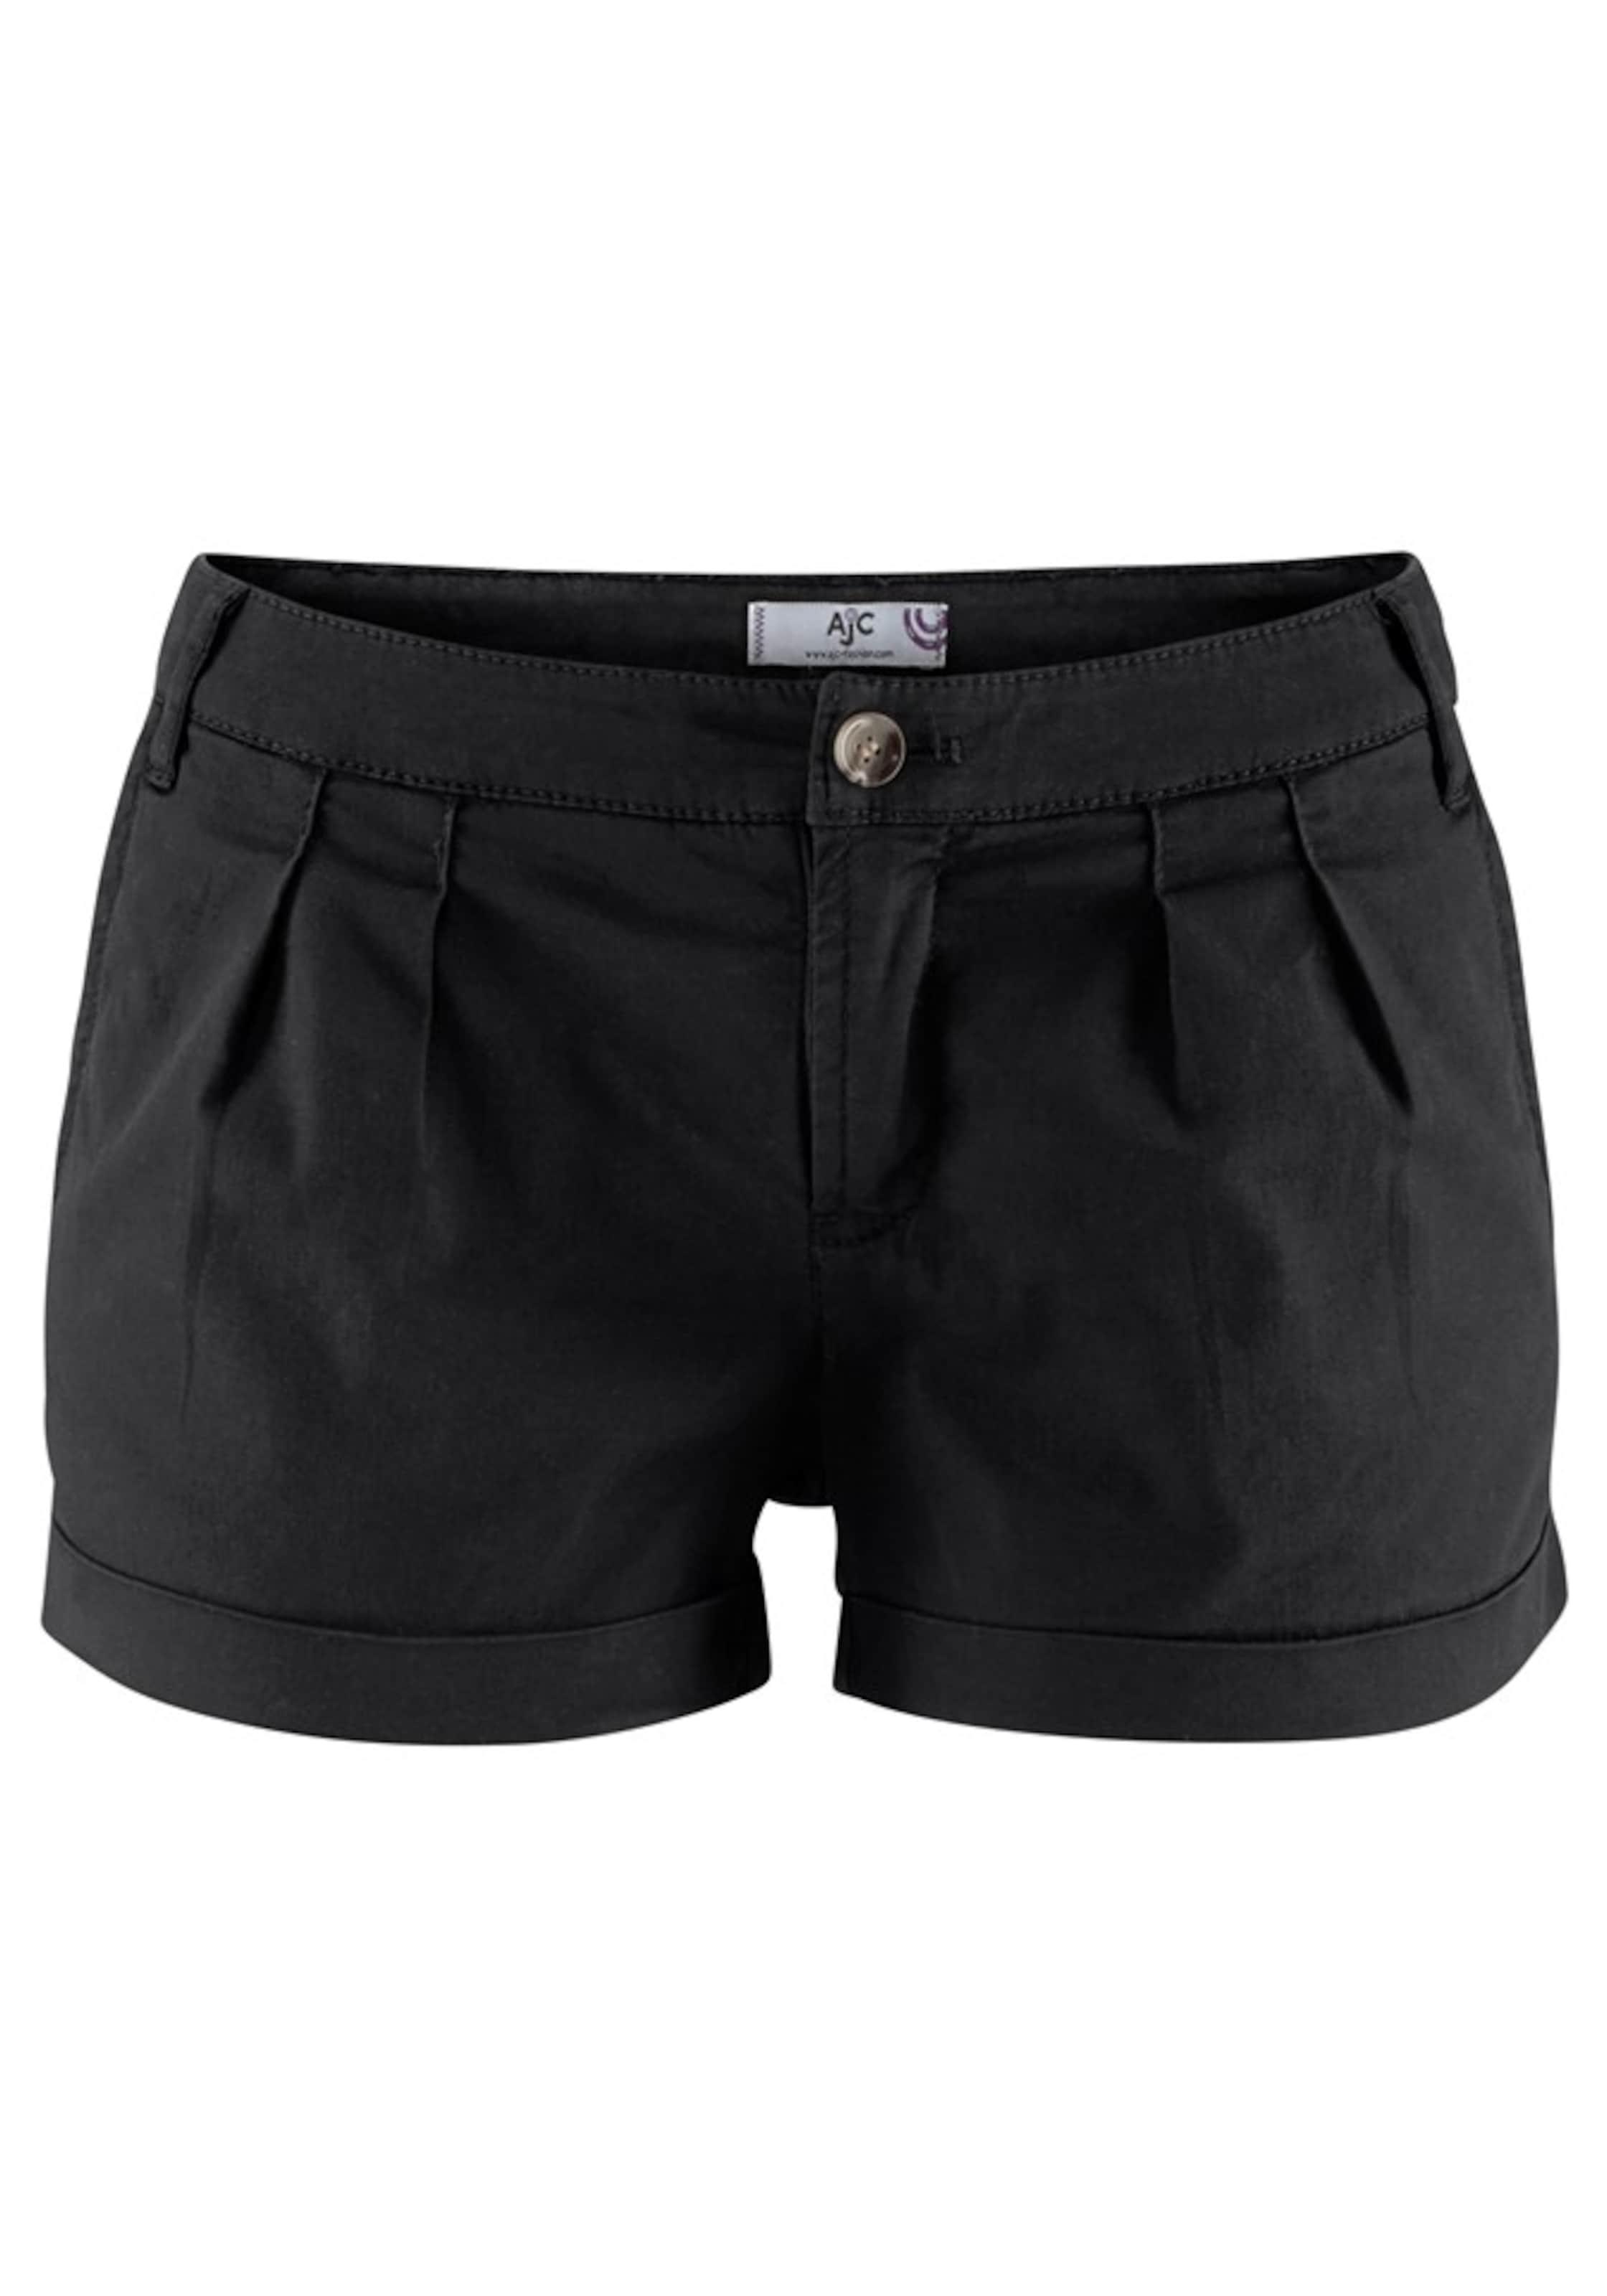 Ajc In Ajc In Shorts Shorts Schwarz mN80Ovnw